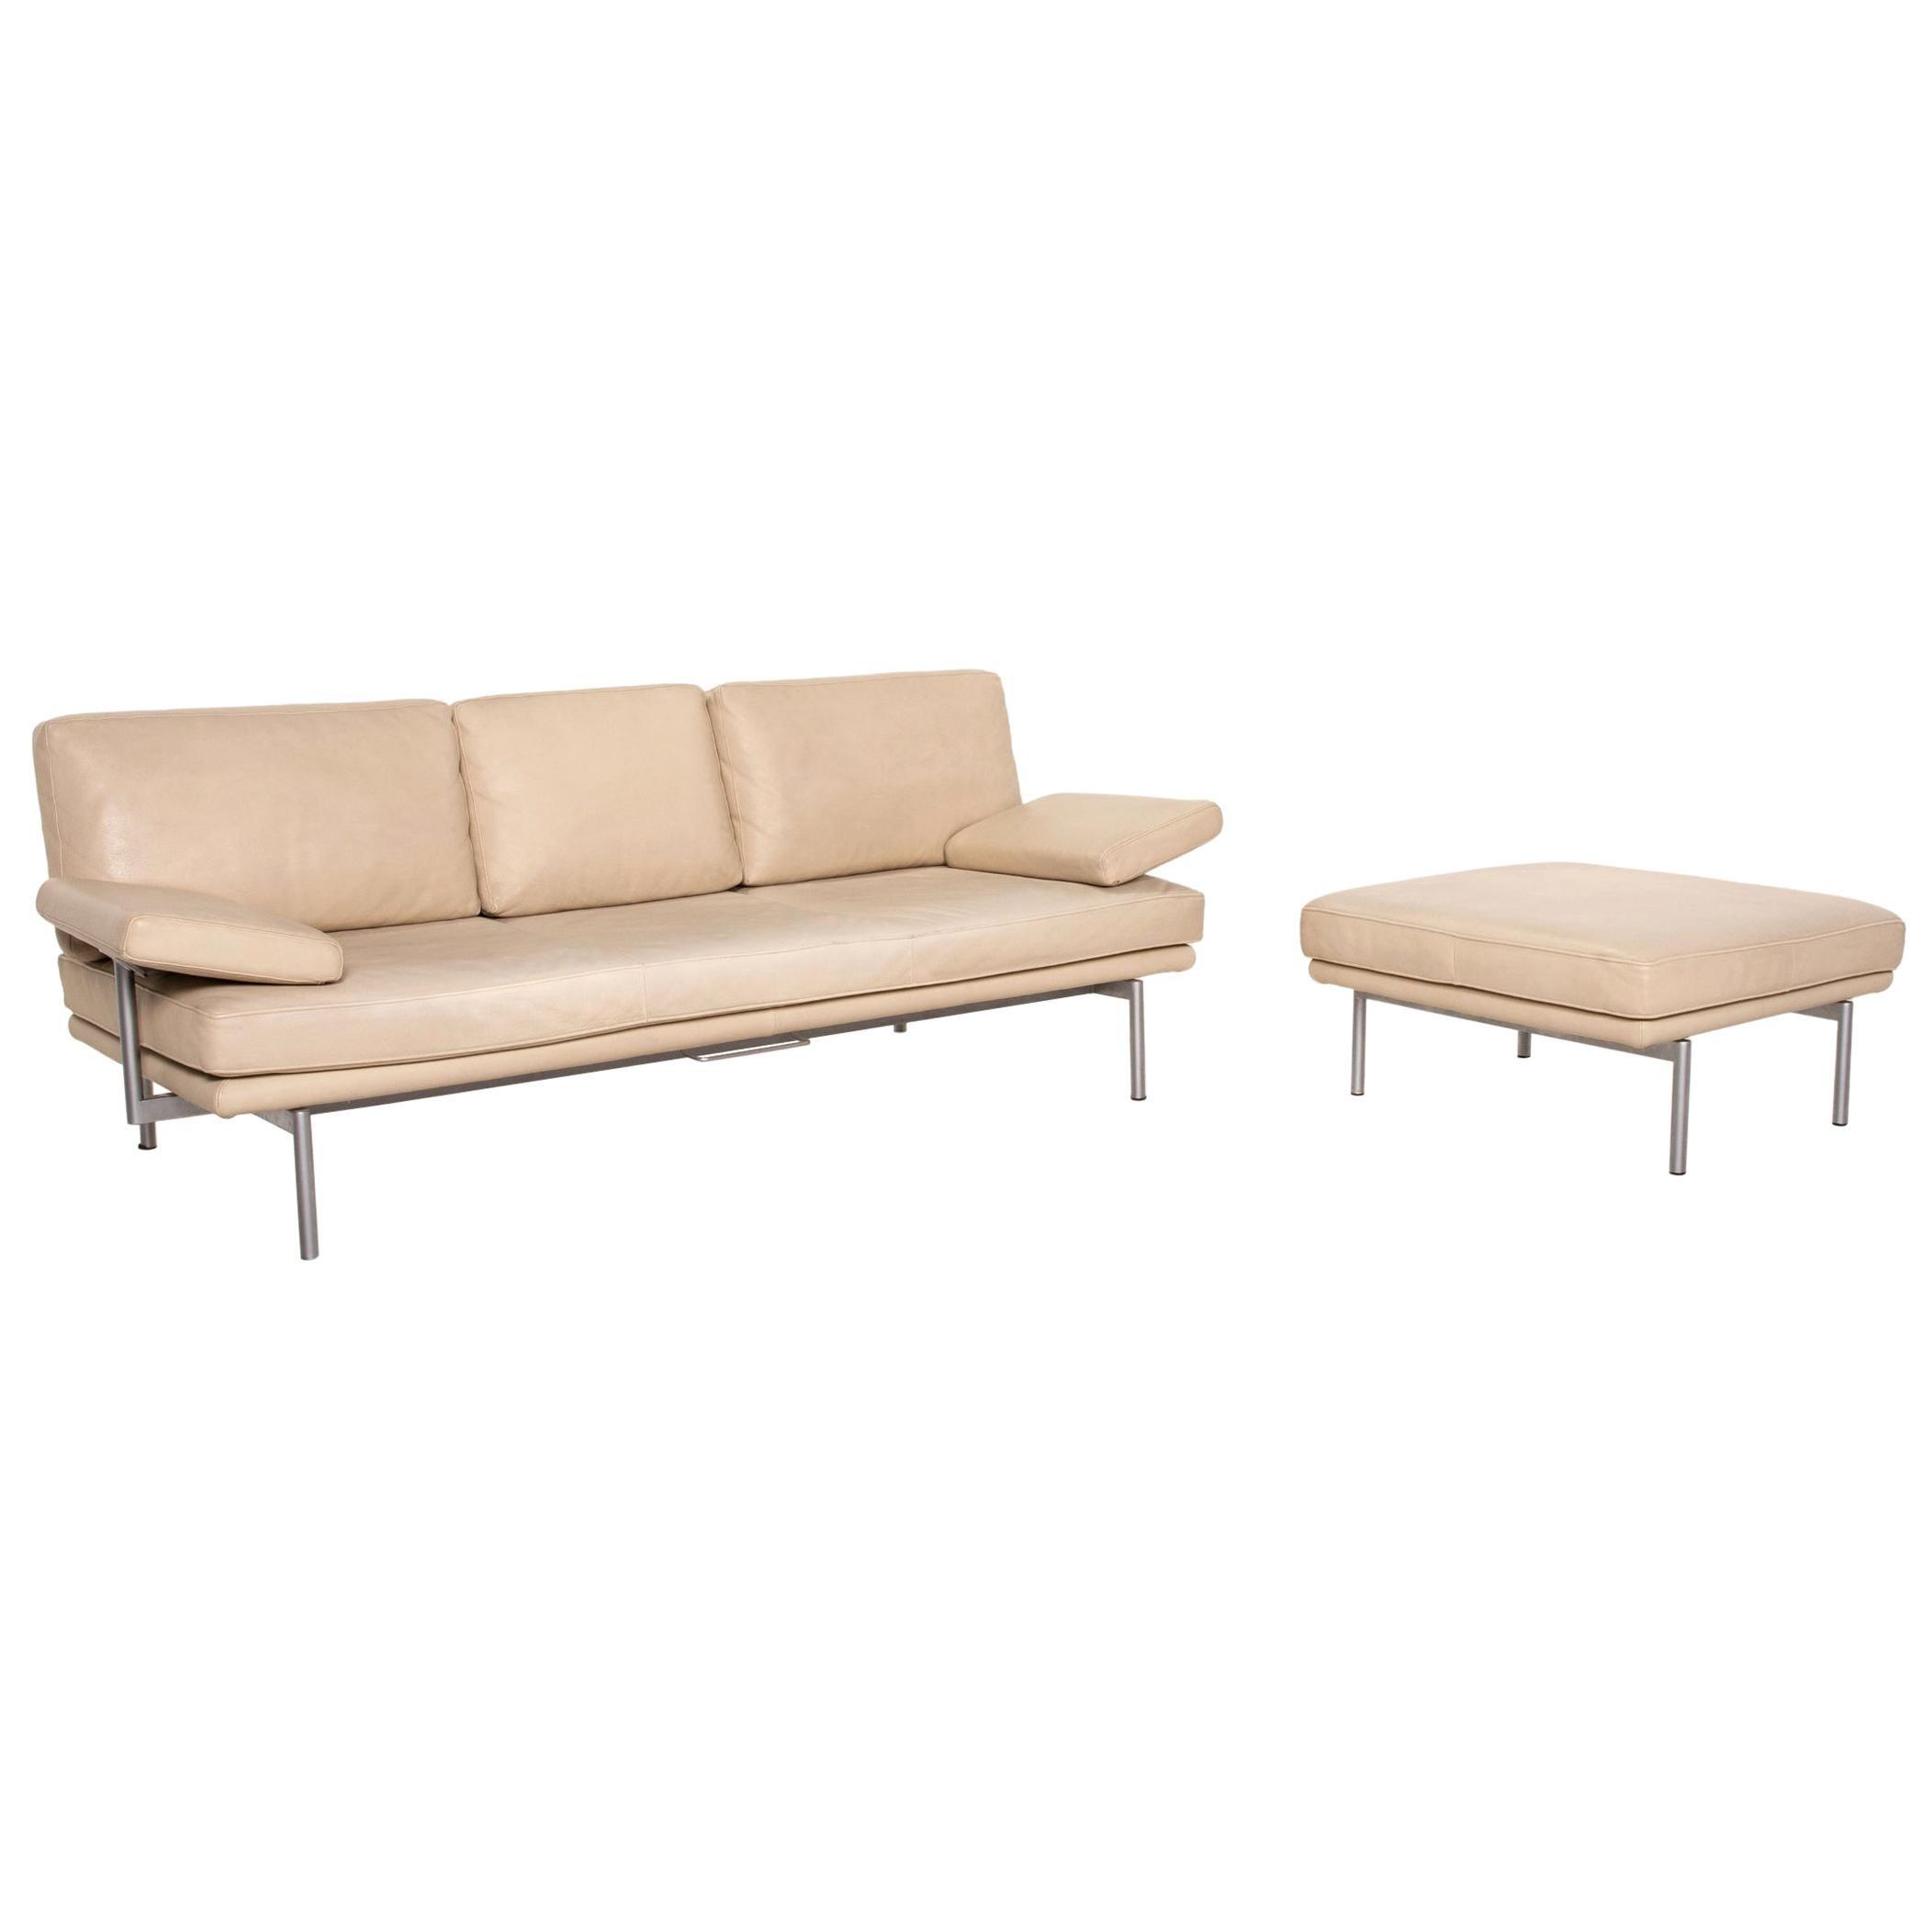 Walter Knoll Living Platform Leather Sofa Set Beige 1x Three-Seater 1x Stool